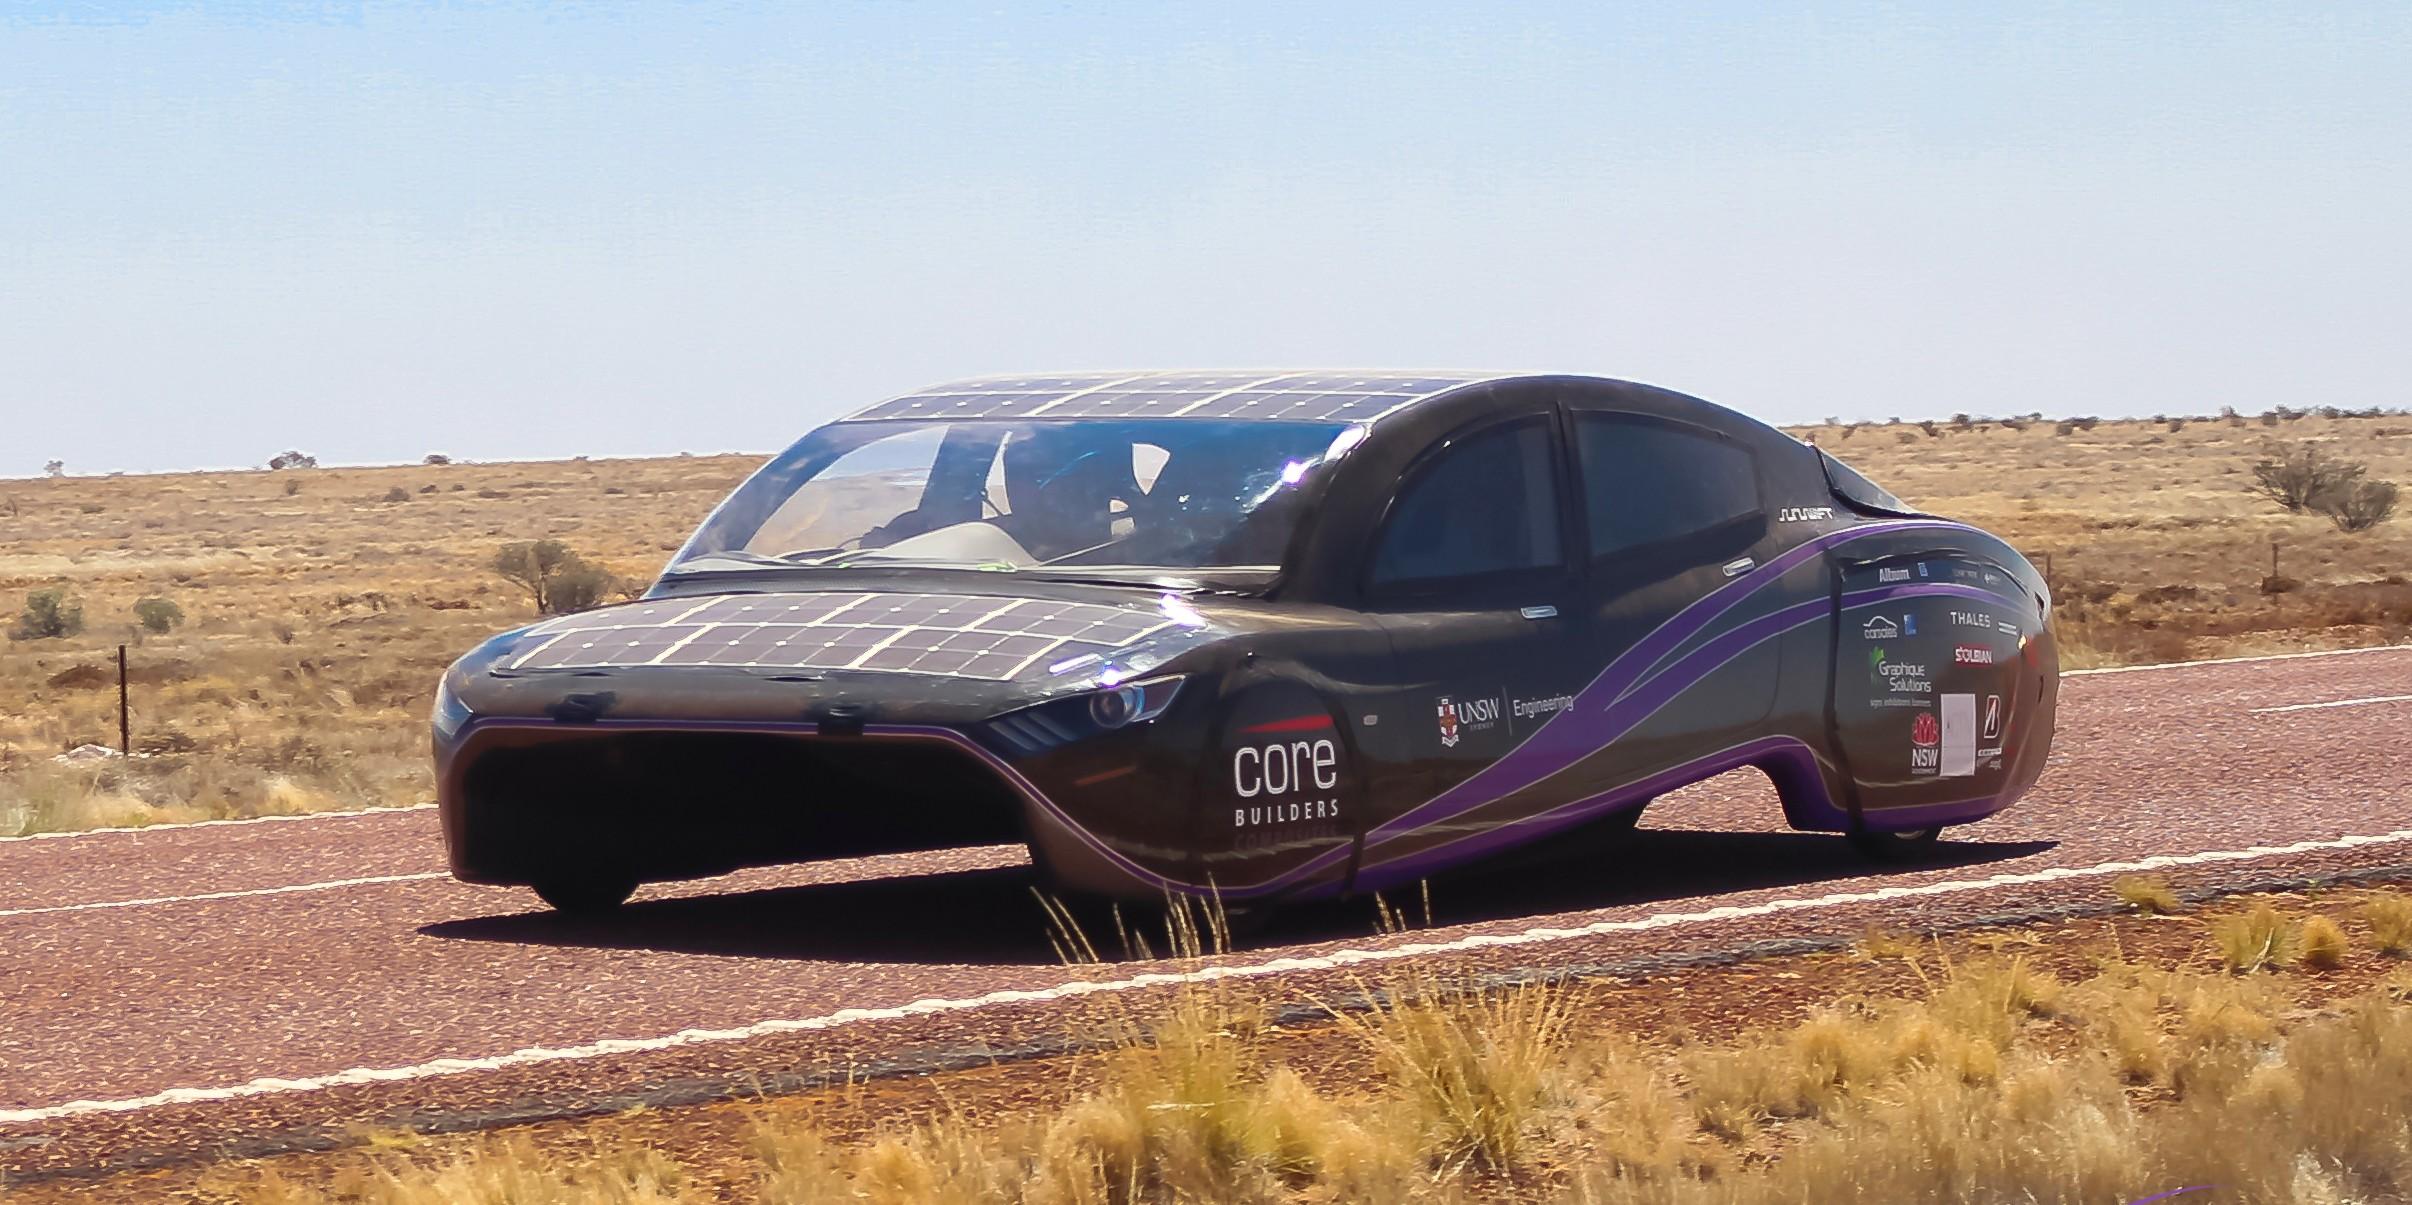 Swunswift-solar-powered-car-header